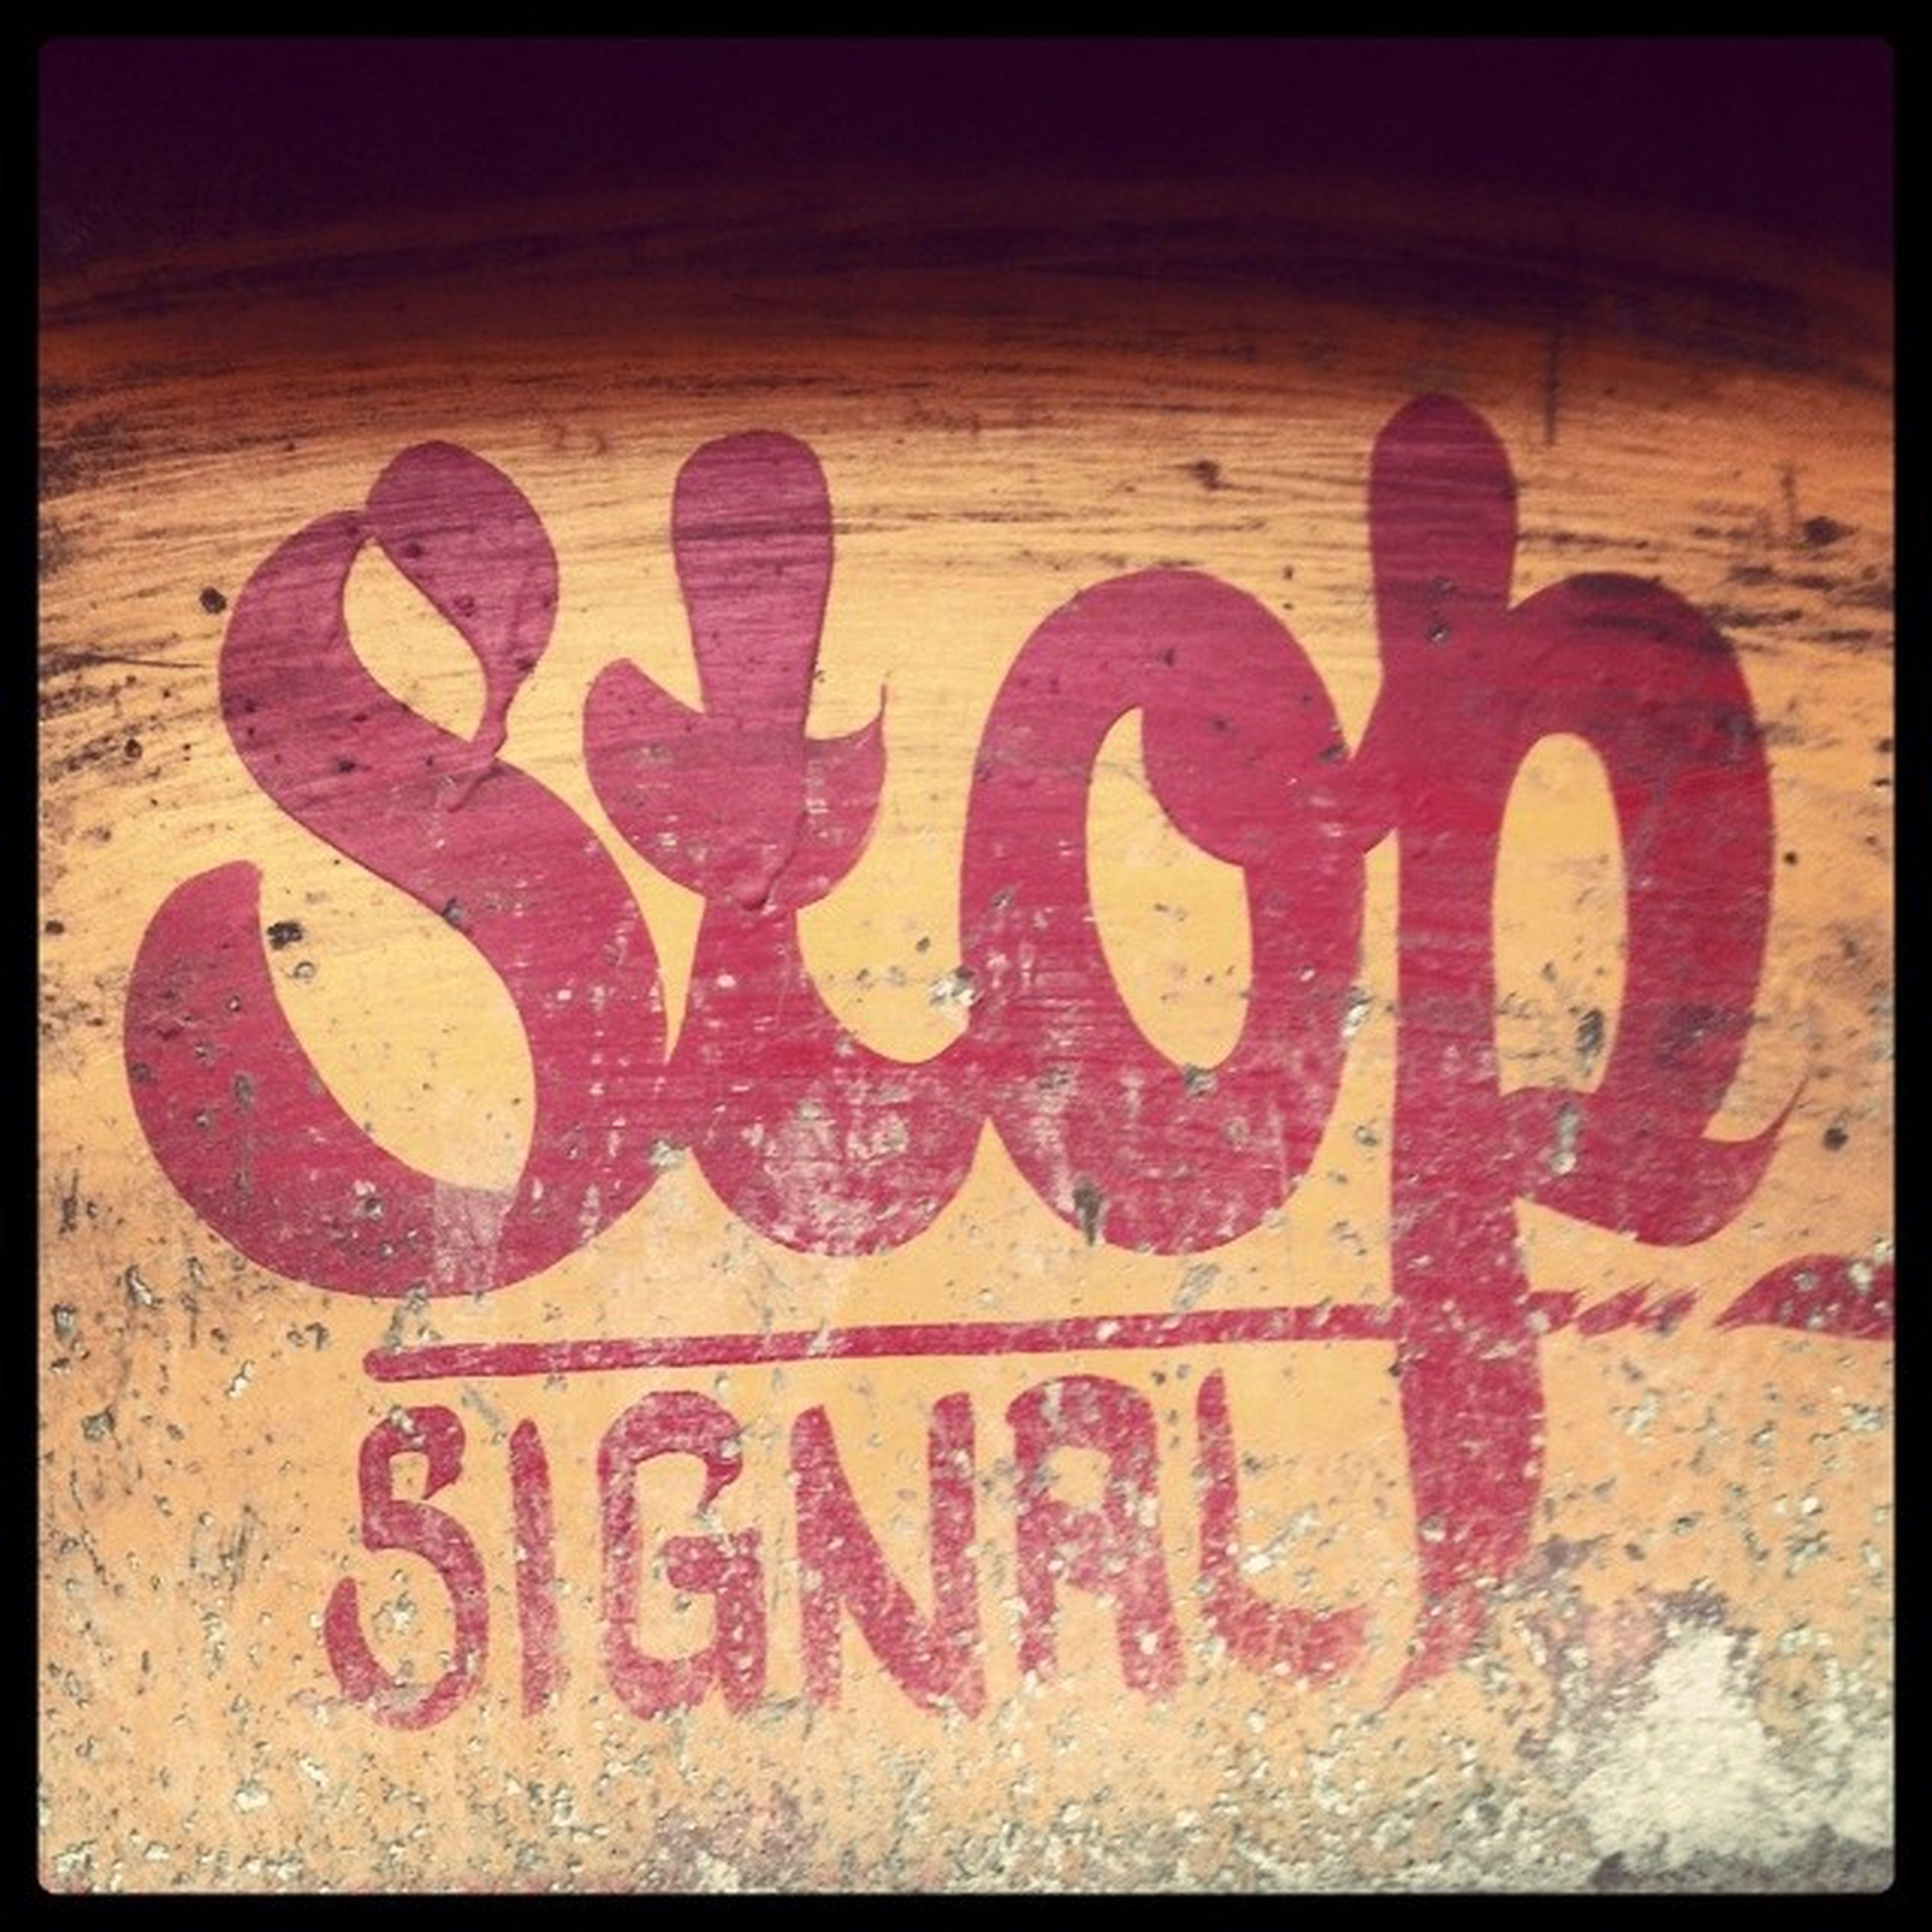 Stopfollowing Startexploring